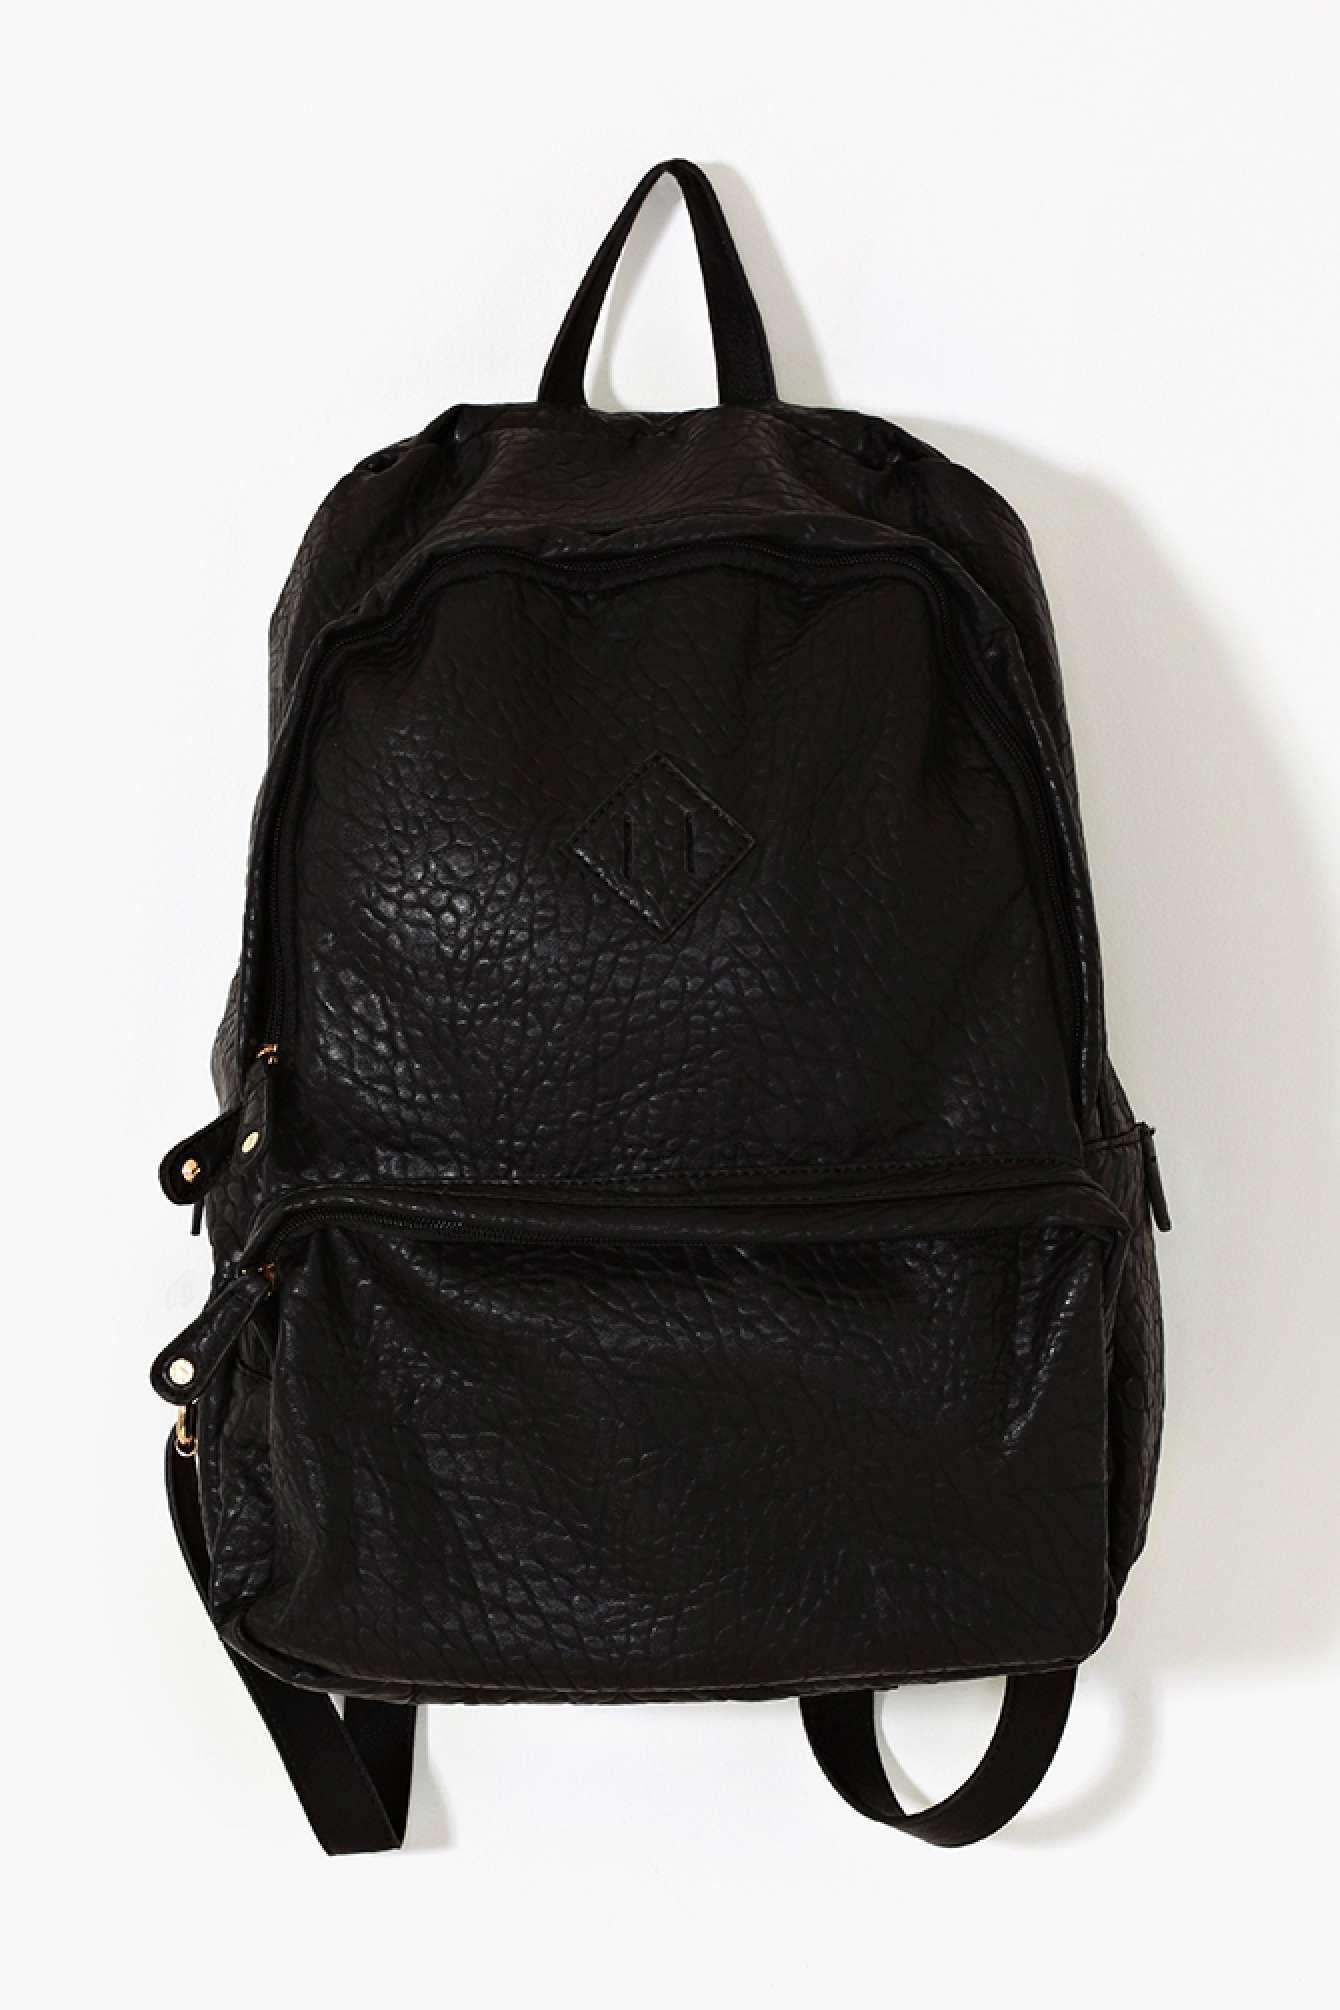 Bad Kids Backpack  ca5c2b99a48cc